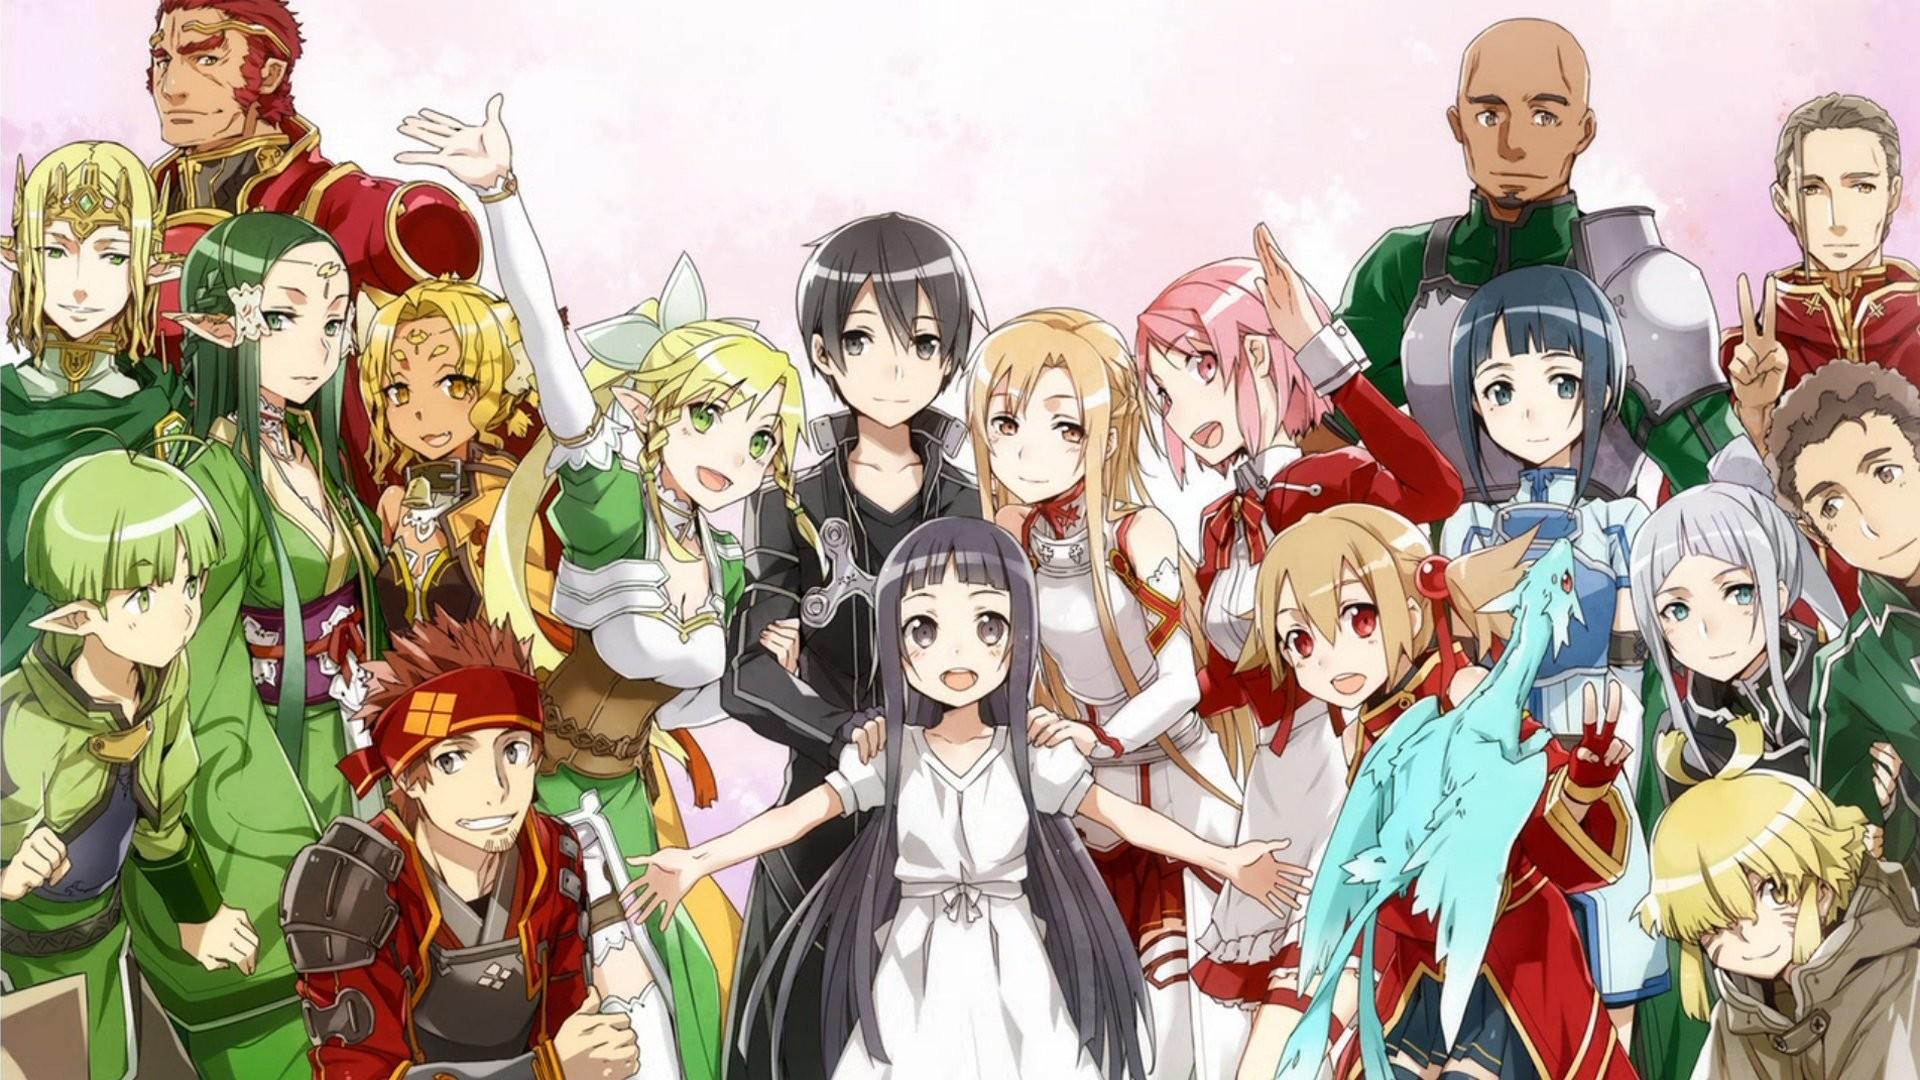 Anime – Sword Art Online Nobuyuki Sugou Eugene (Sword Art Online) Thinker  (Sword